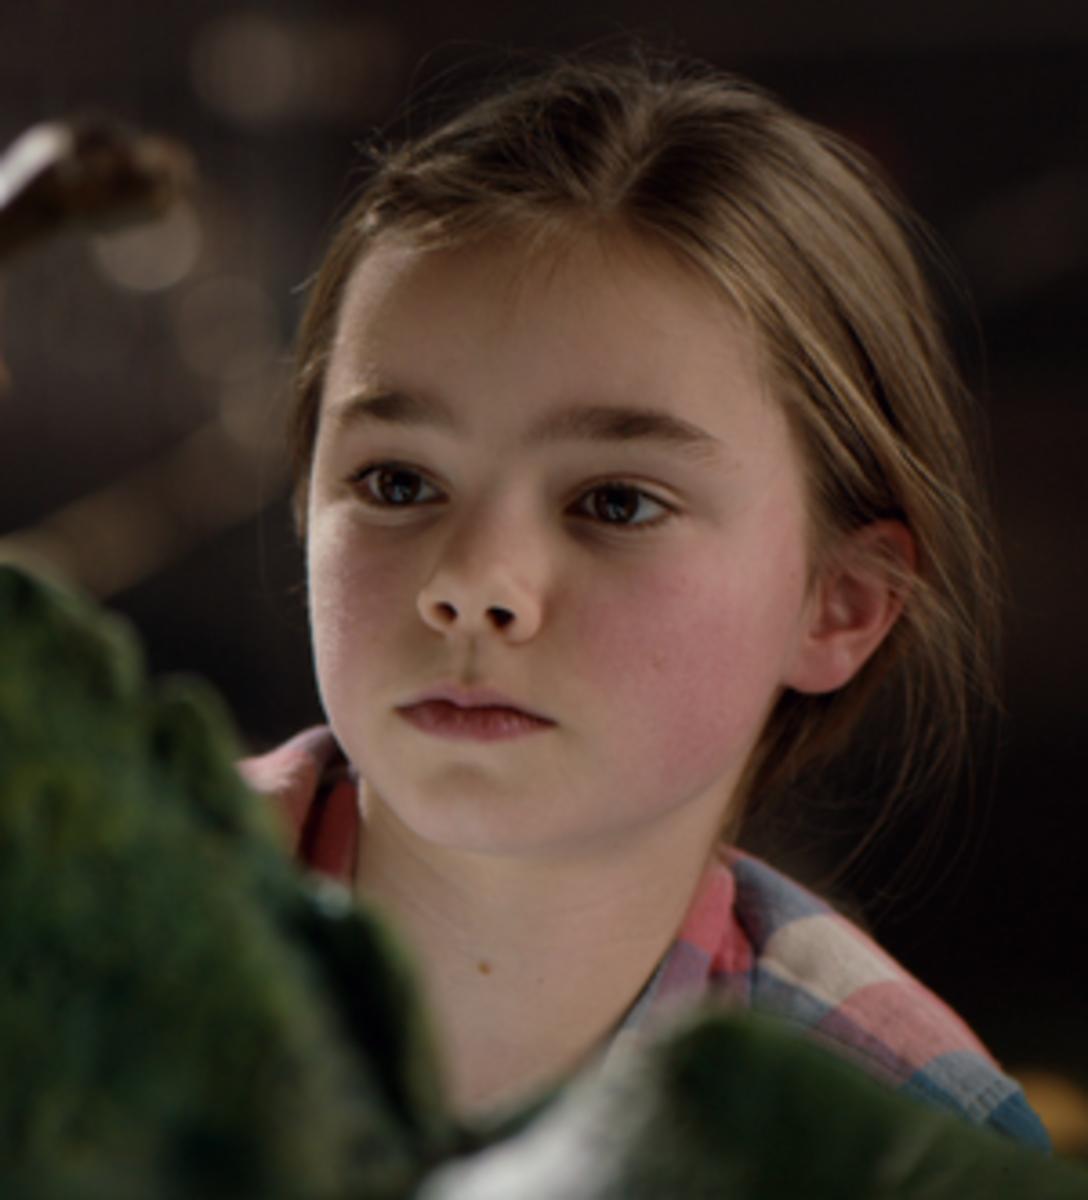 Maisie Lockwood, played by Isabella Sermon